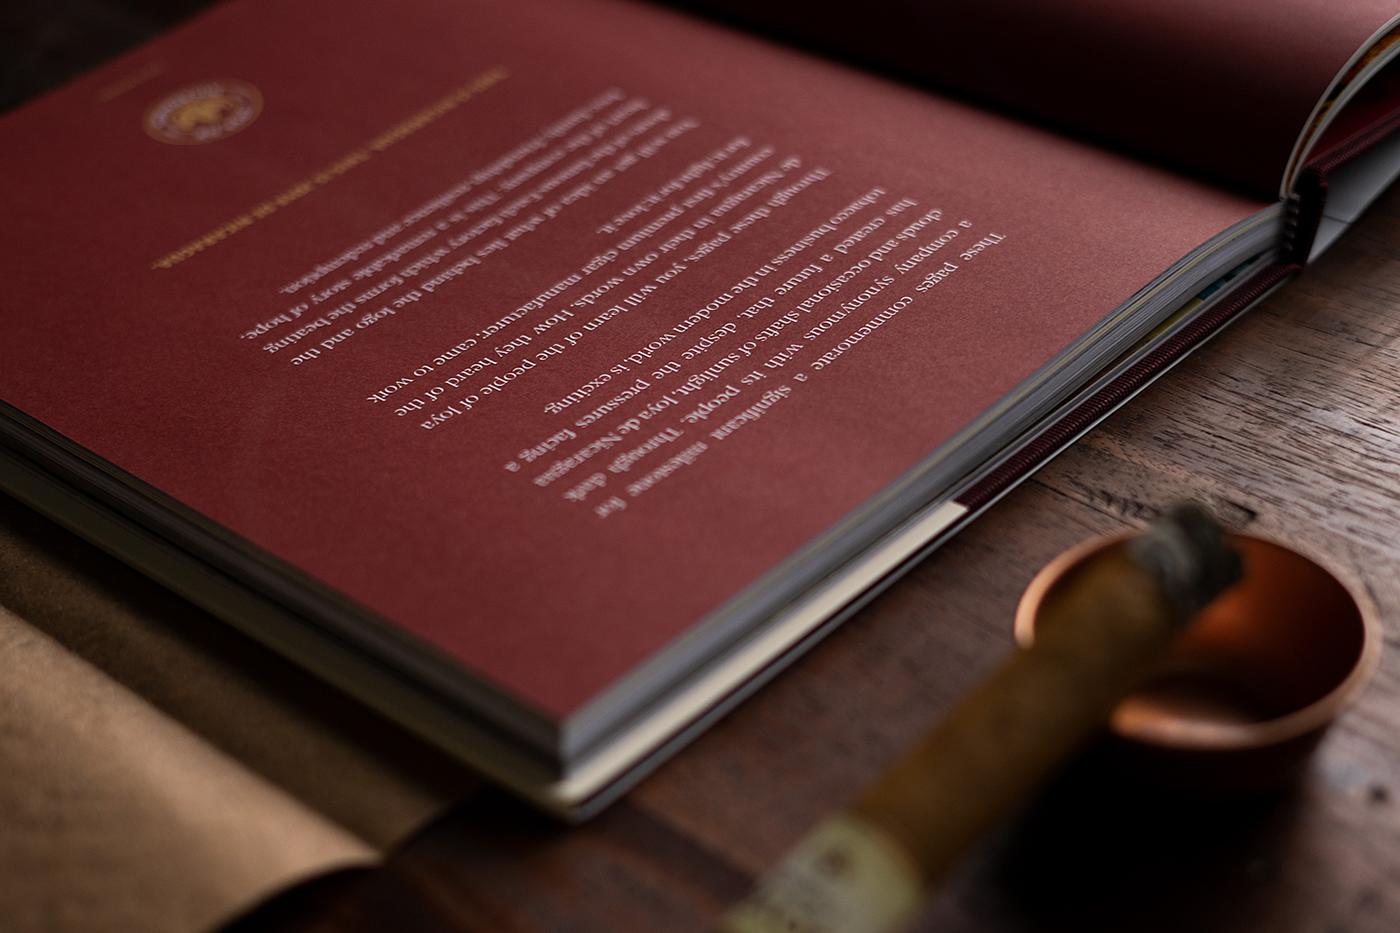 editorial,cigars,joya,nicaragua,anniversary,book,luxury,history,pupila,Costa Rica